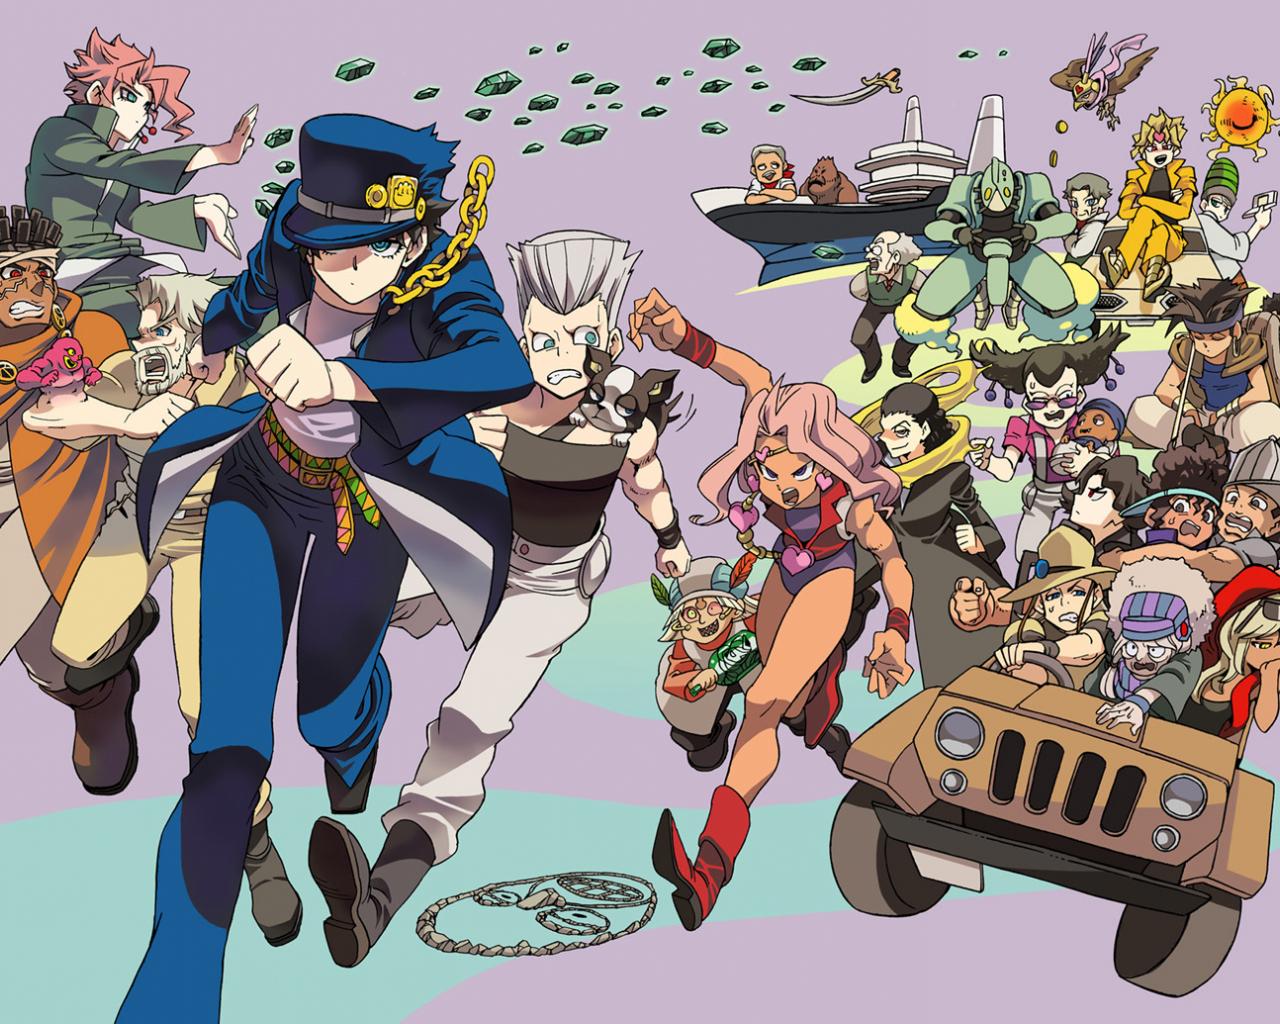 Free Download Anime Wallpapers Jojos Bizarre Adventure Anime